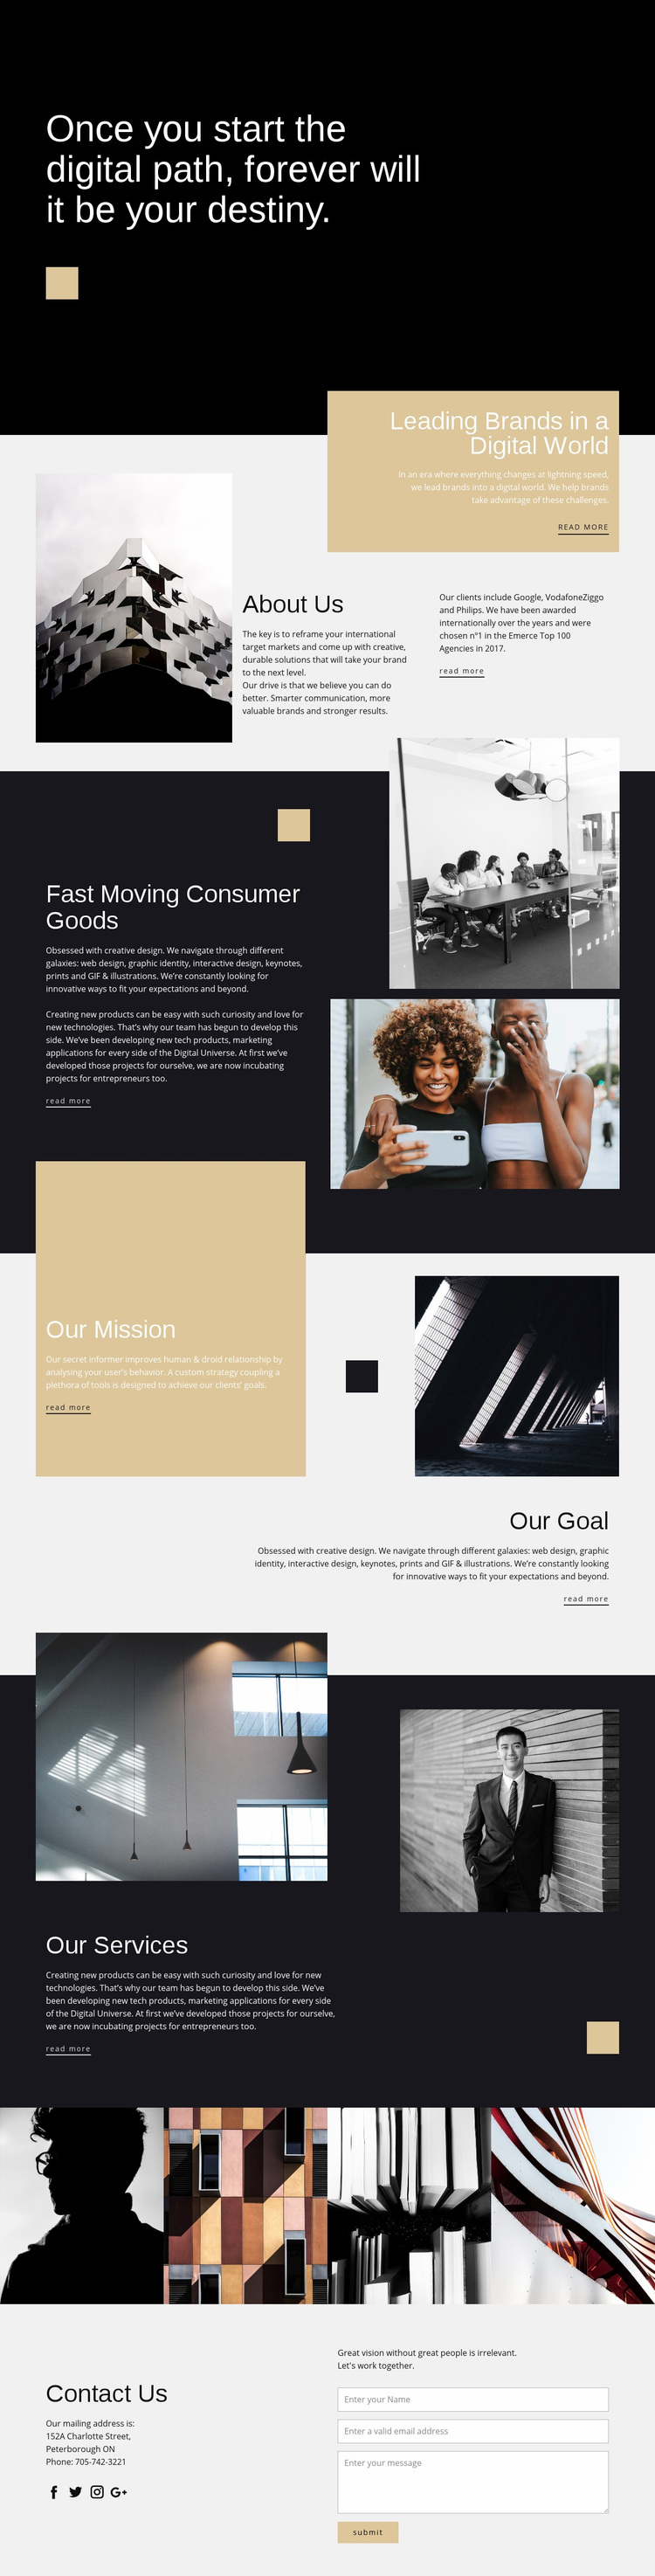 Destiny photo studio Web Page Designer